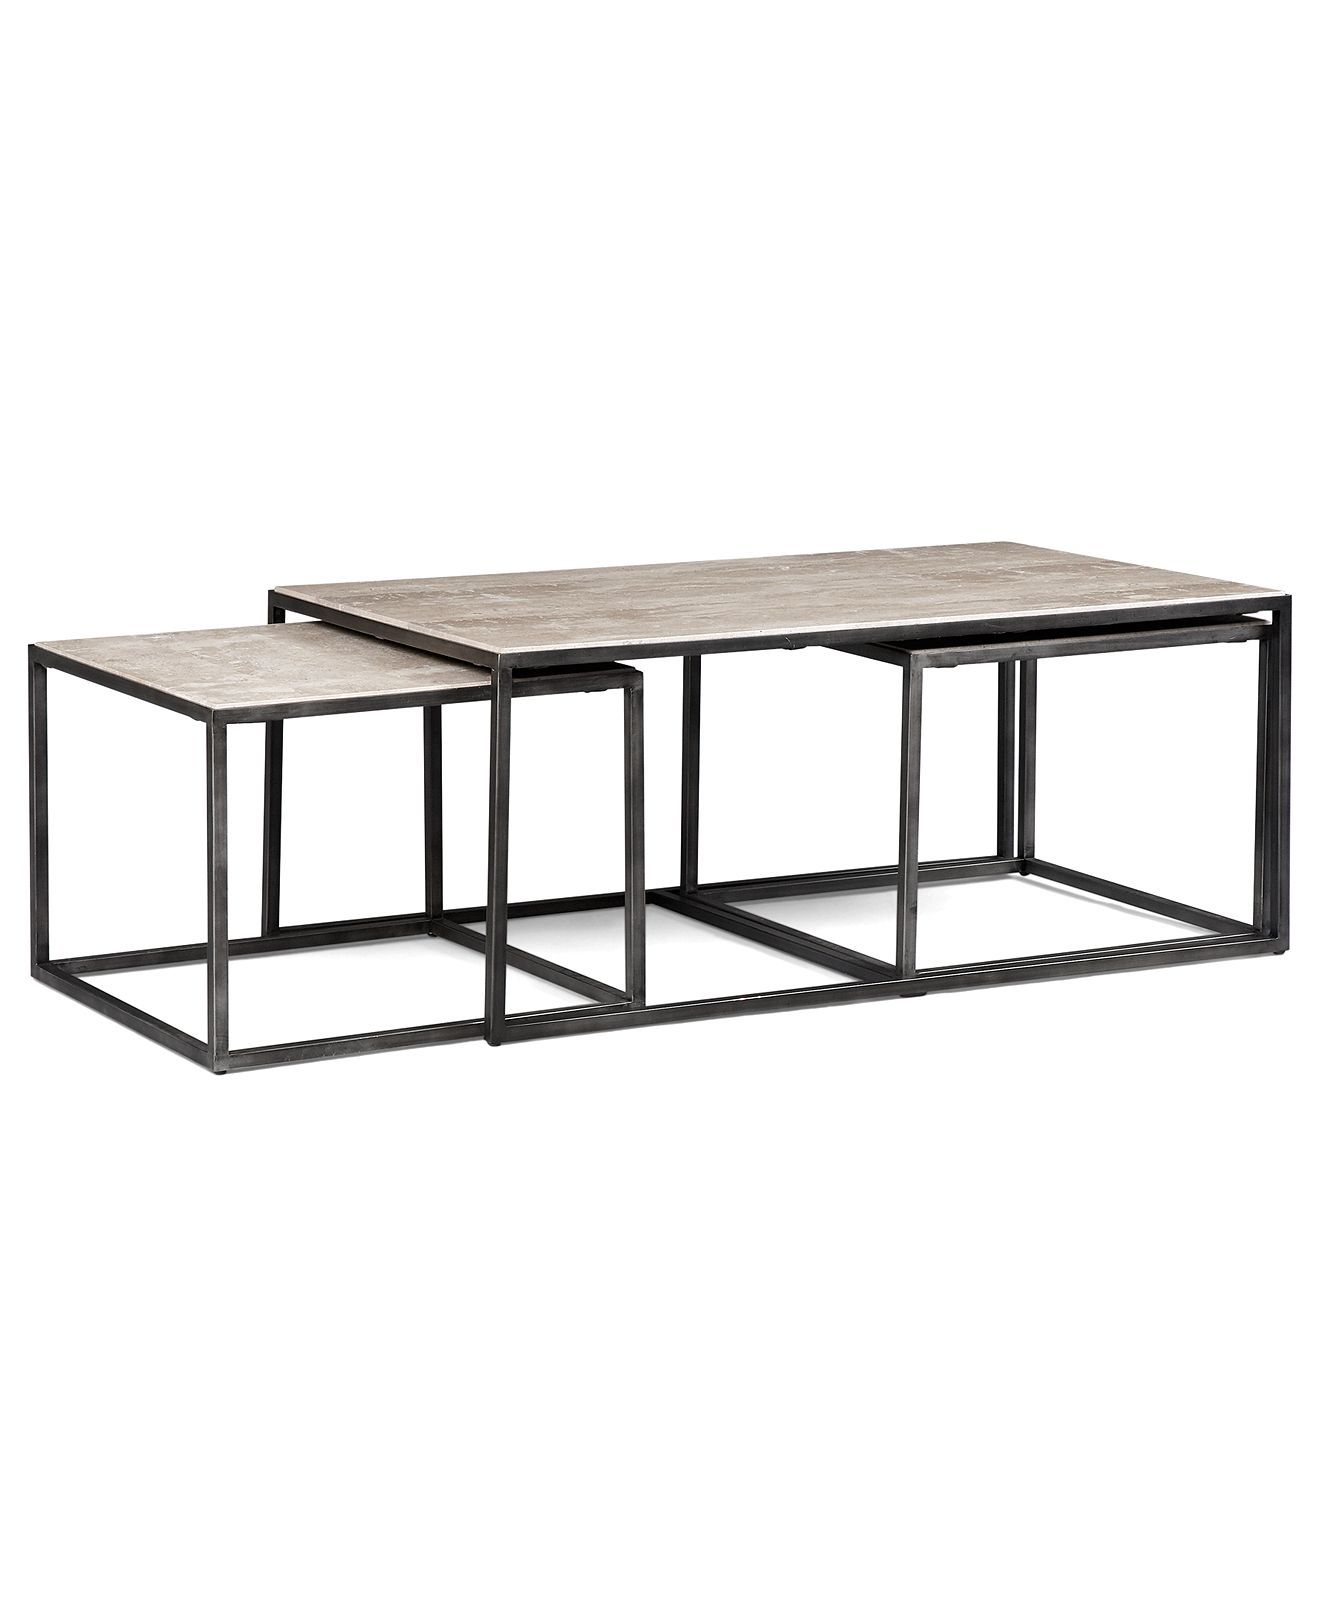 Monterey Coffee Table, Rectangular Nesting   Furniture   Macyu0027s